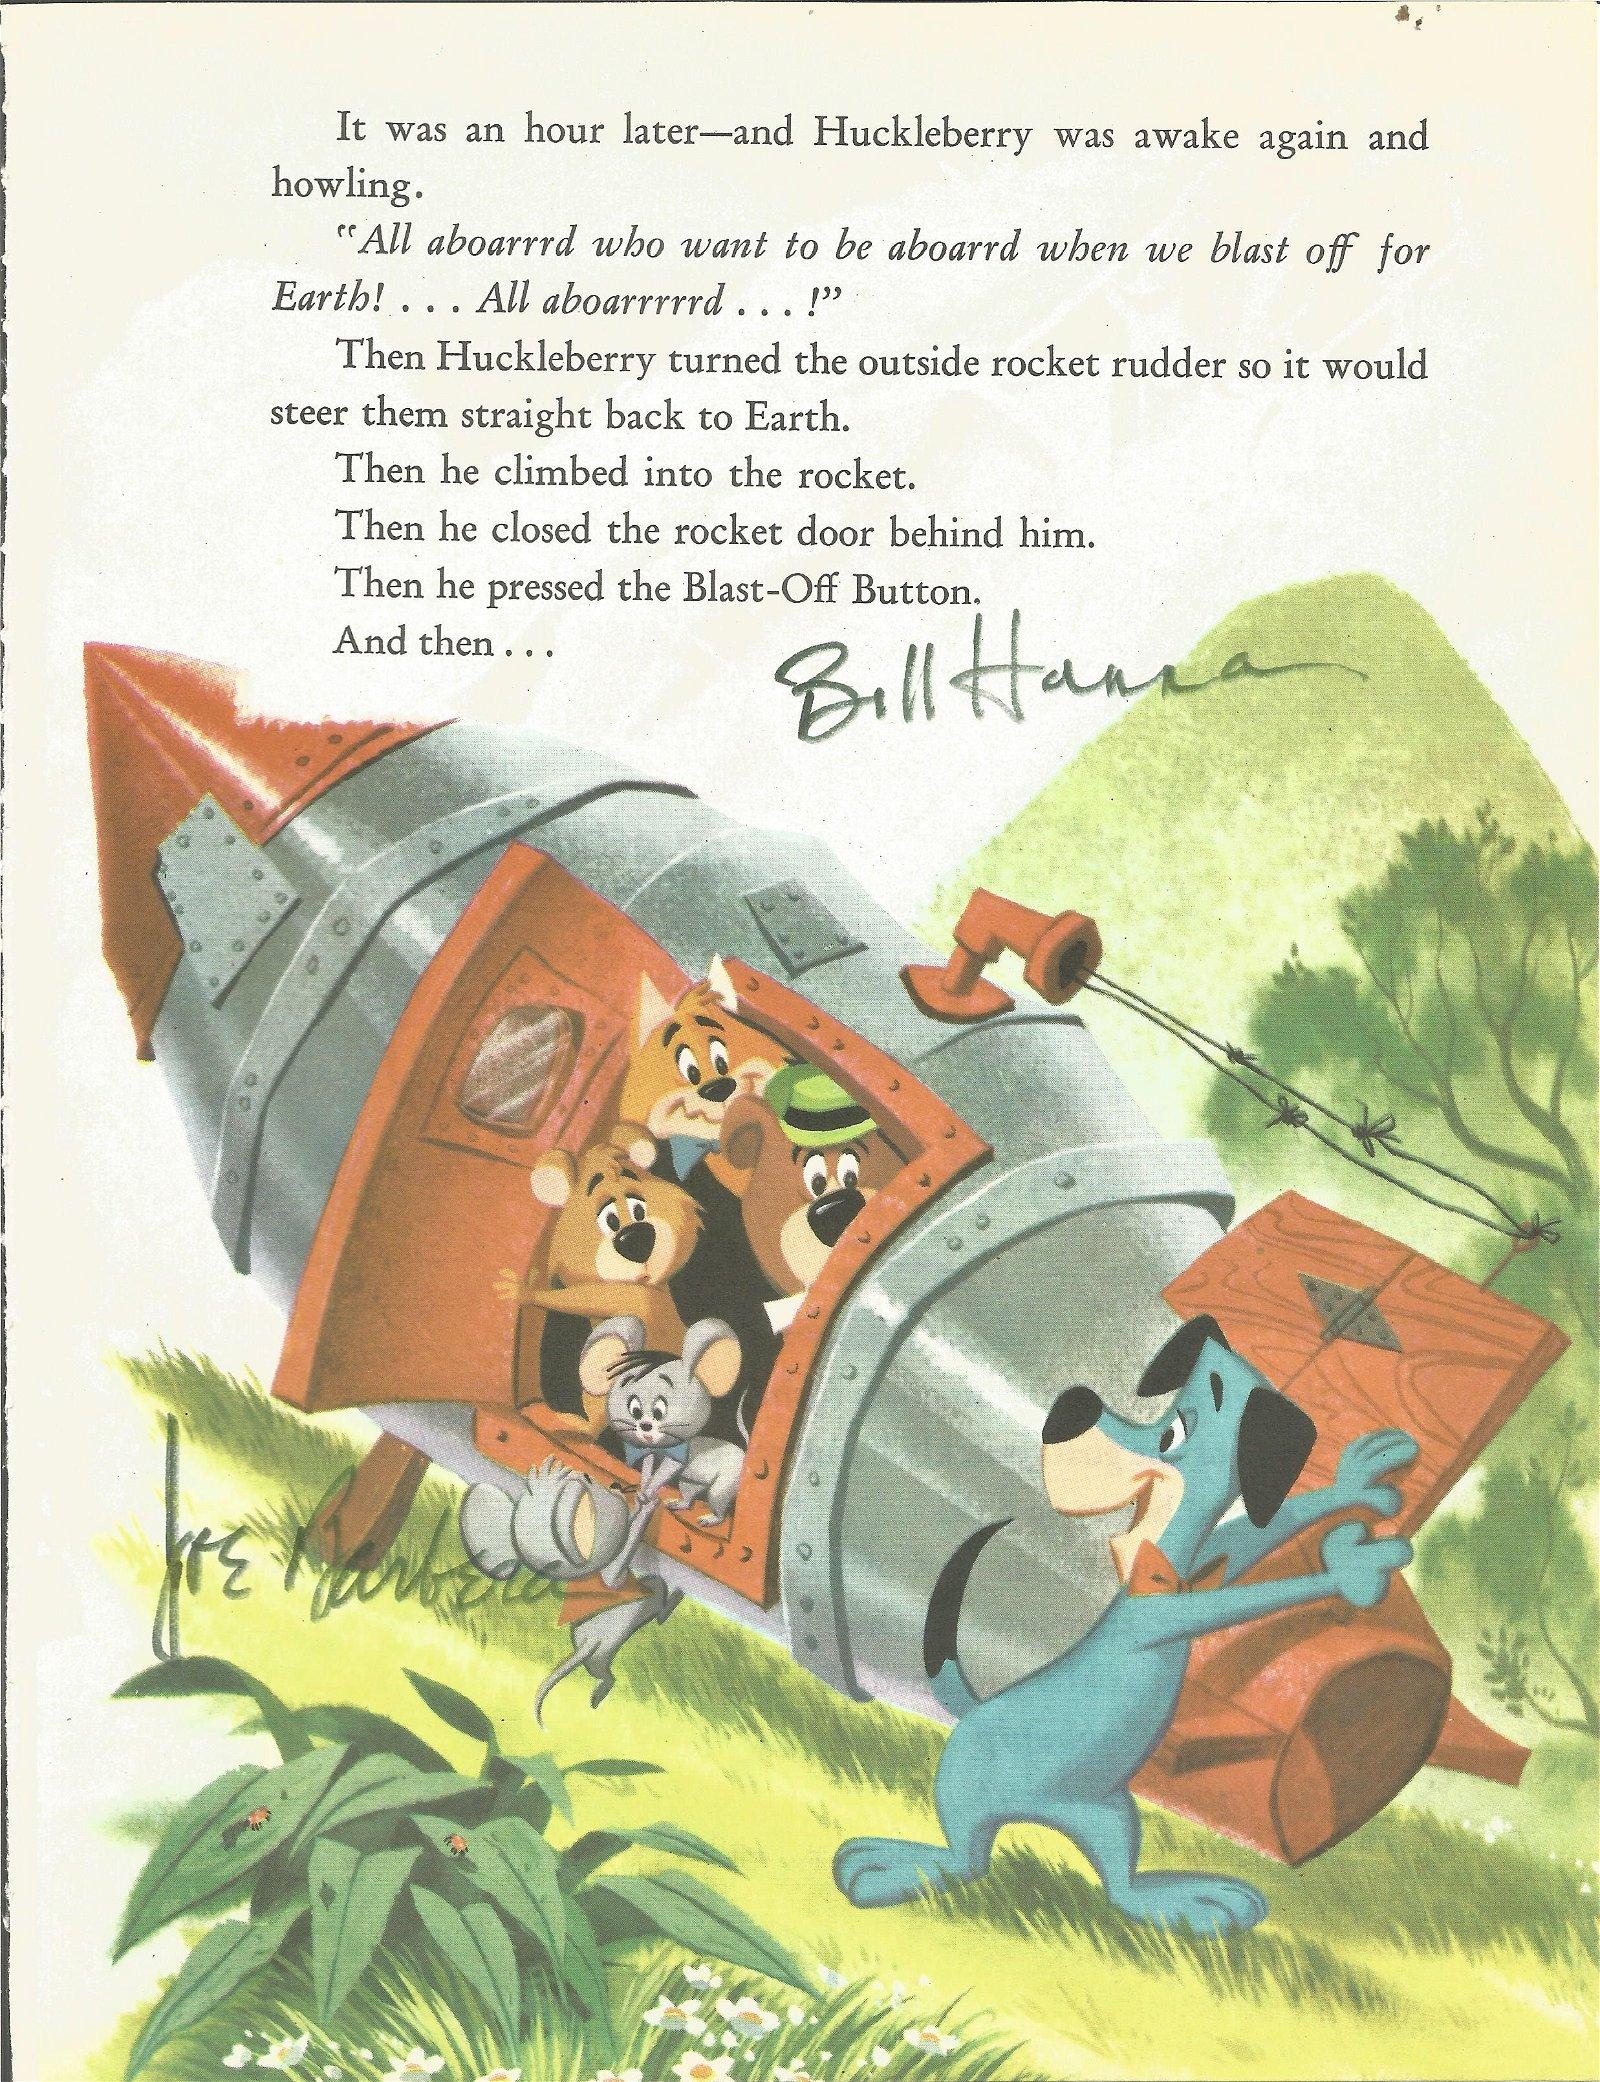 Bill Hanna and Joe Barbera signed animated book page.